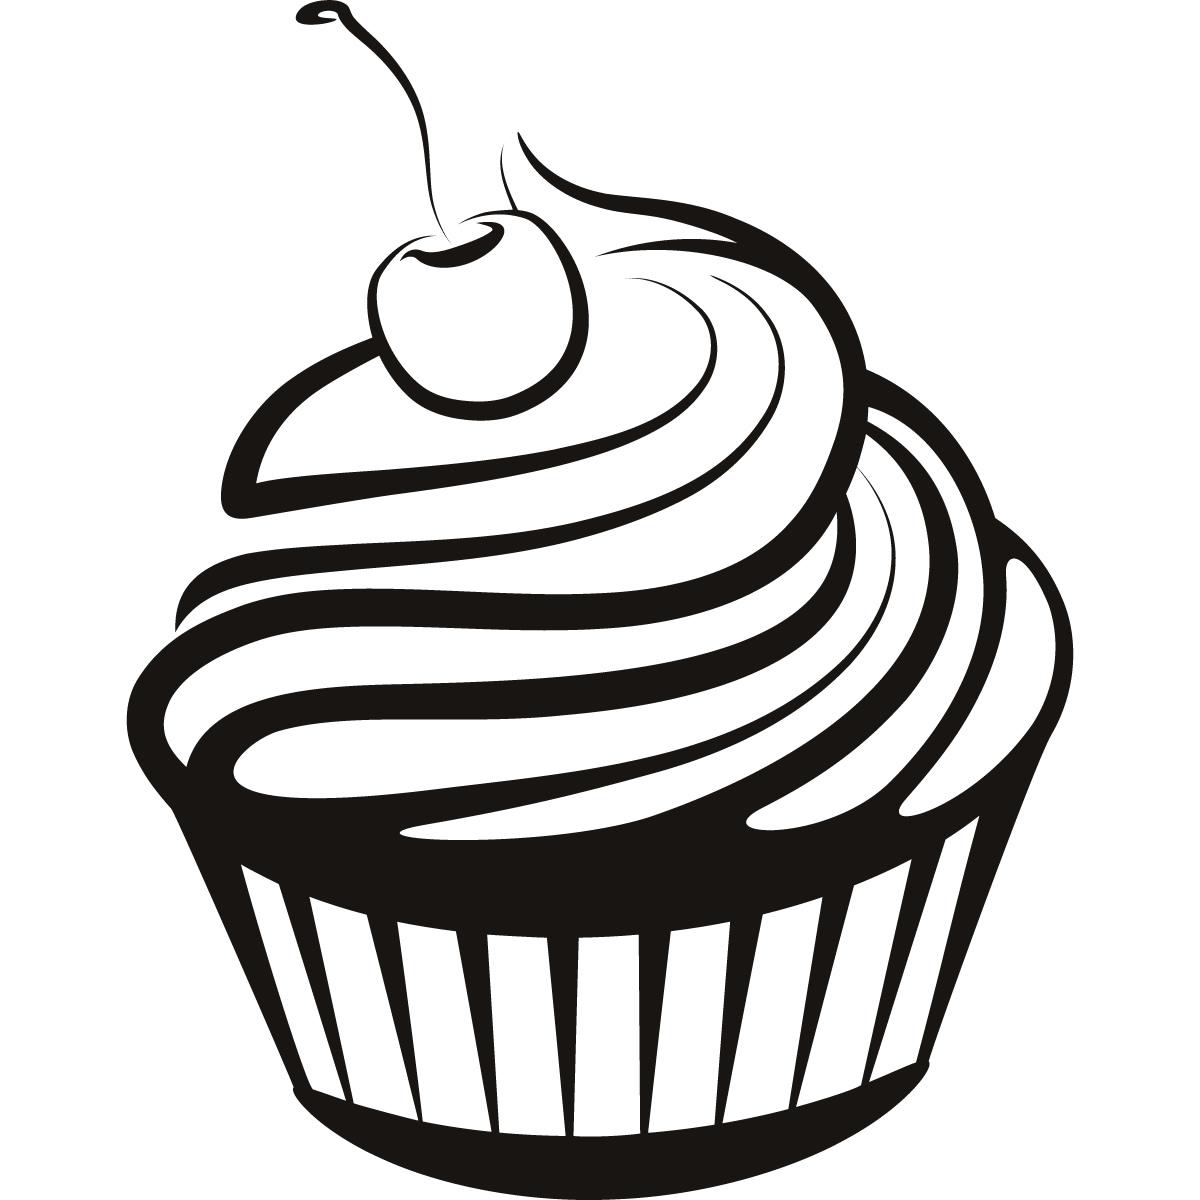 Cupcake Black And White Cupcake Drawings And Cupcakes